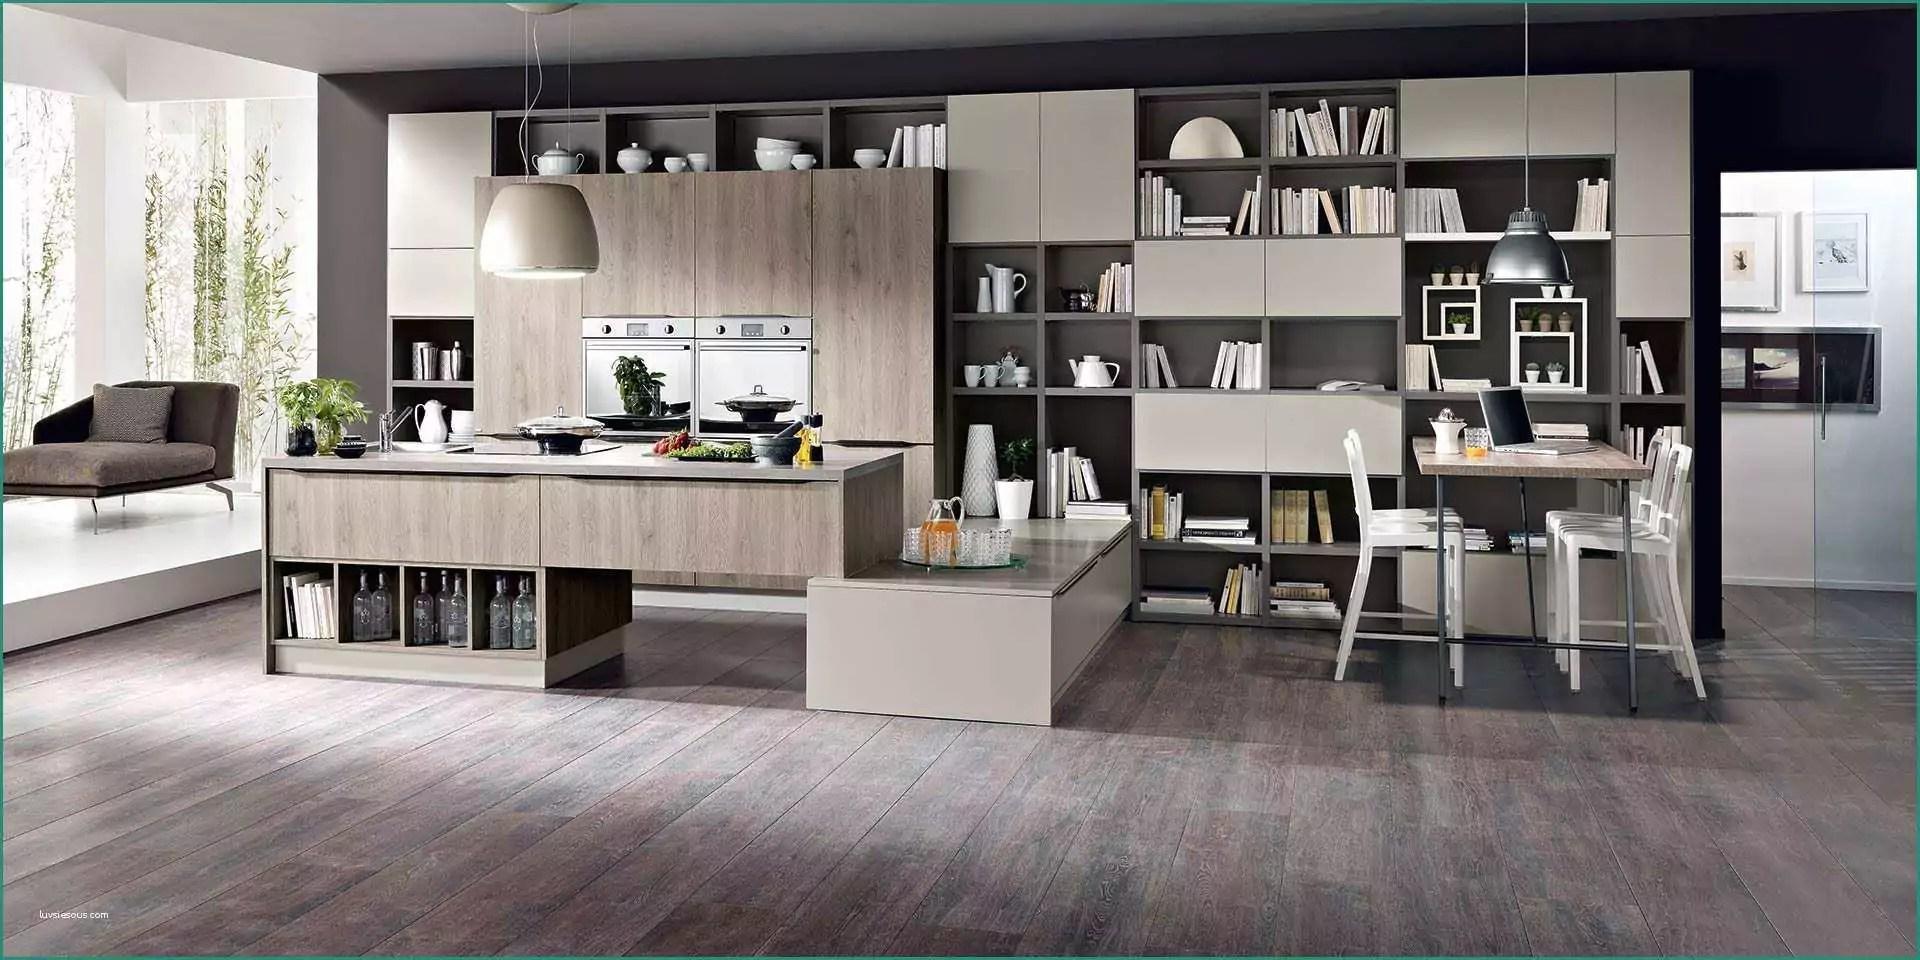 Cucina Classica Moderna | Cucina Arredamento Moderno Le Migliori ...